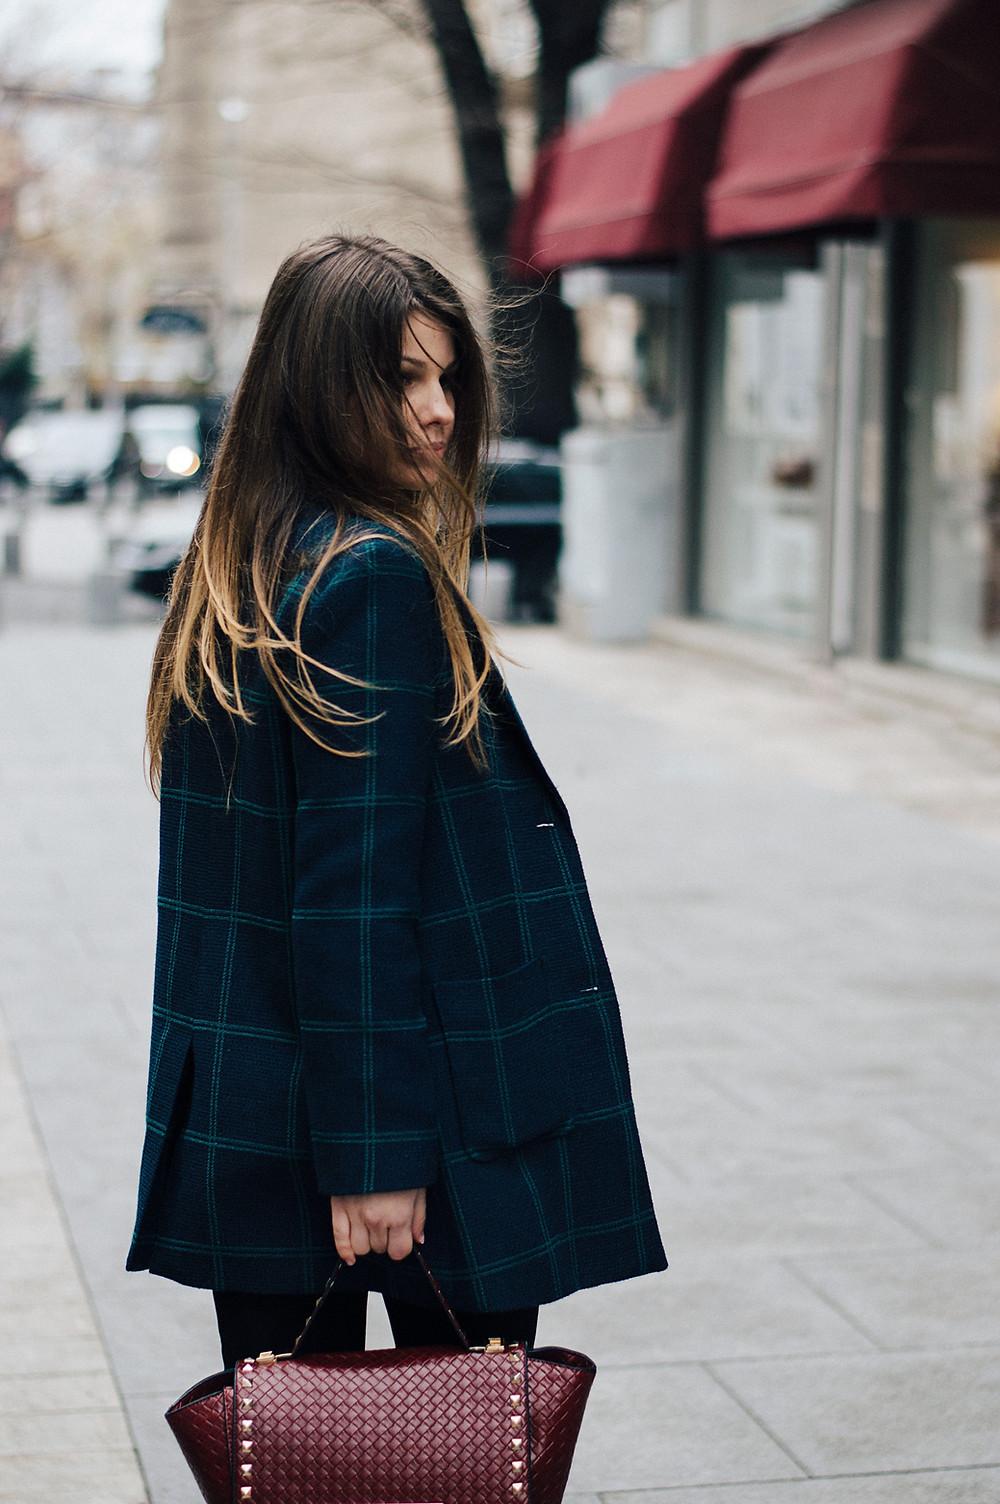 urban girl fashion